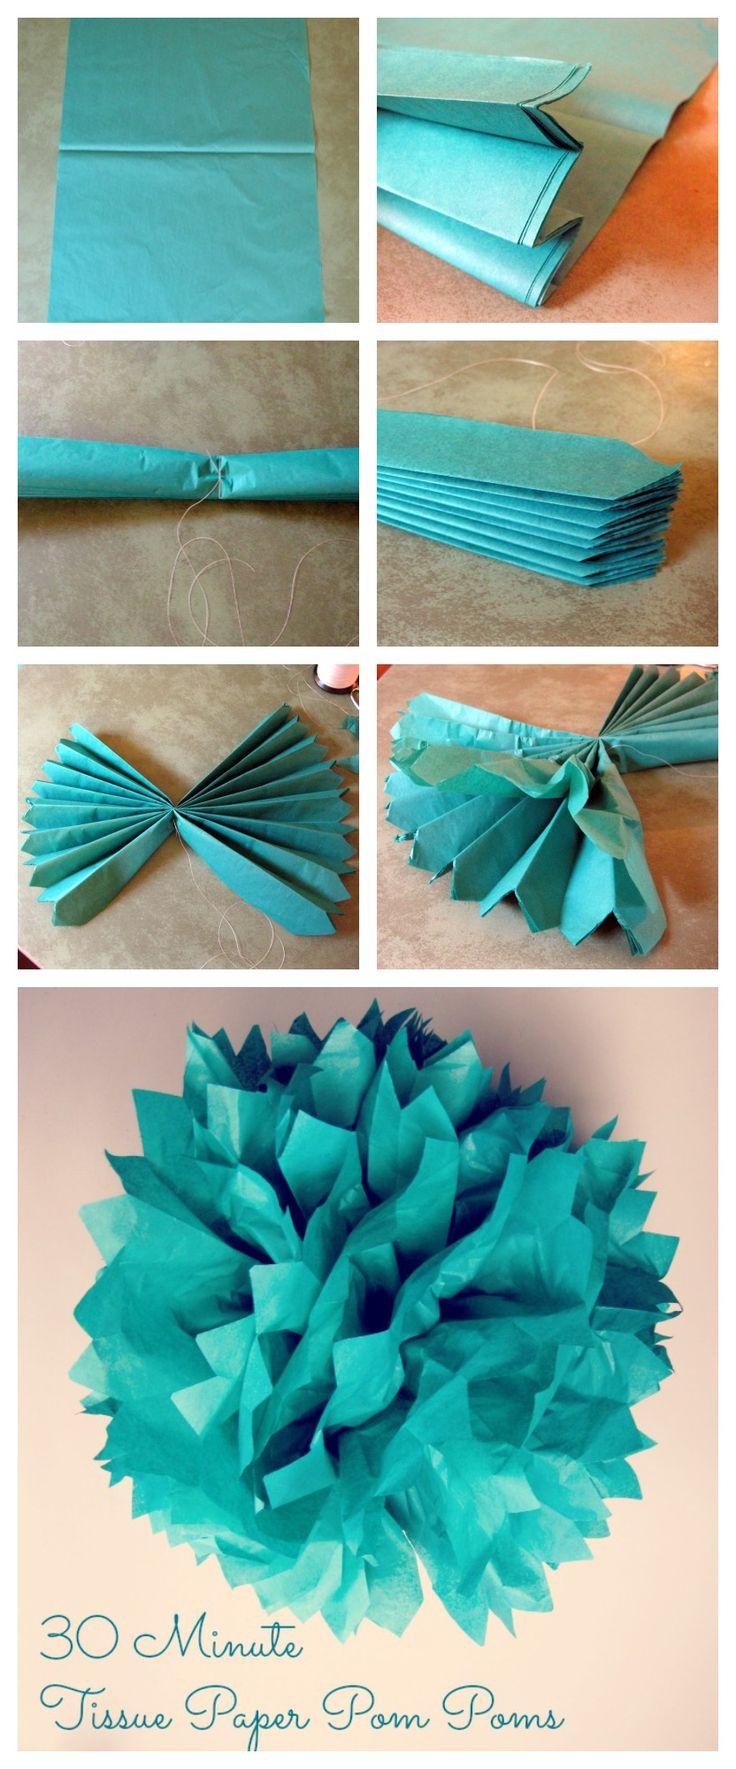 30 Minute Tissue Paper Pom Tutorial